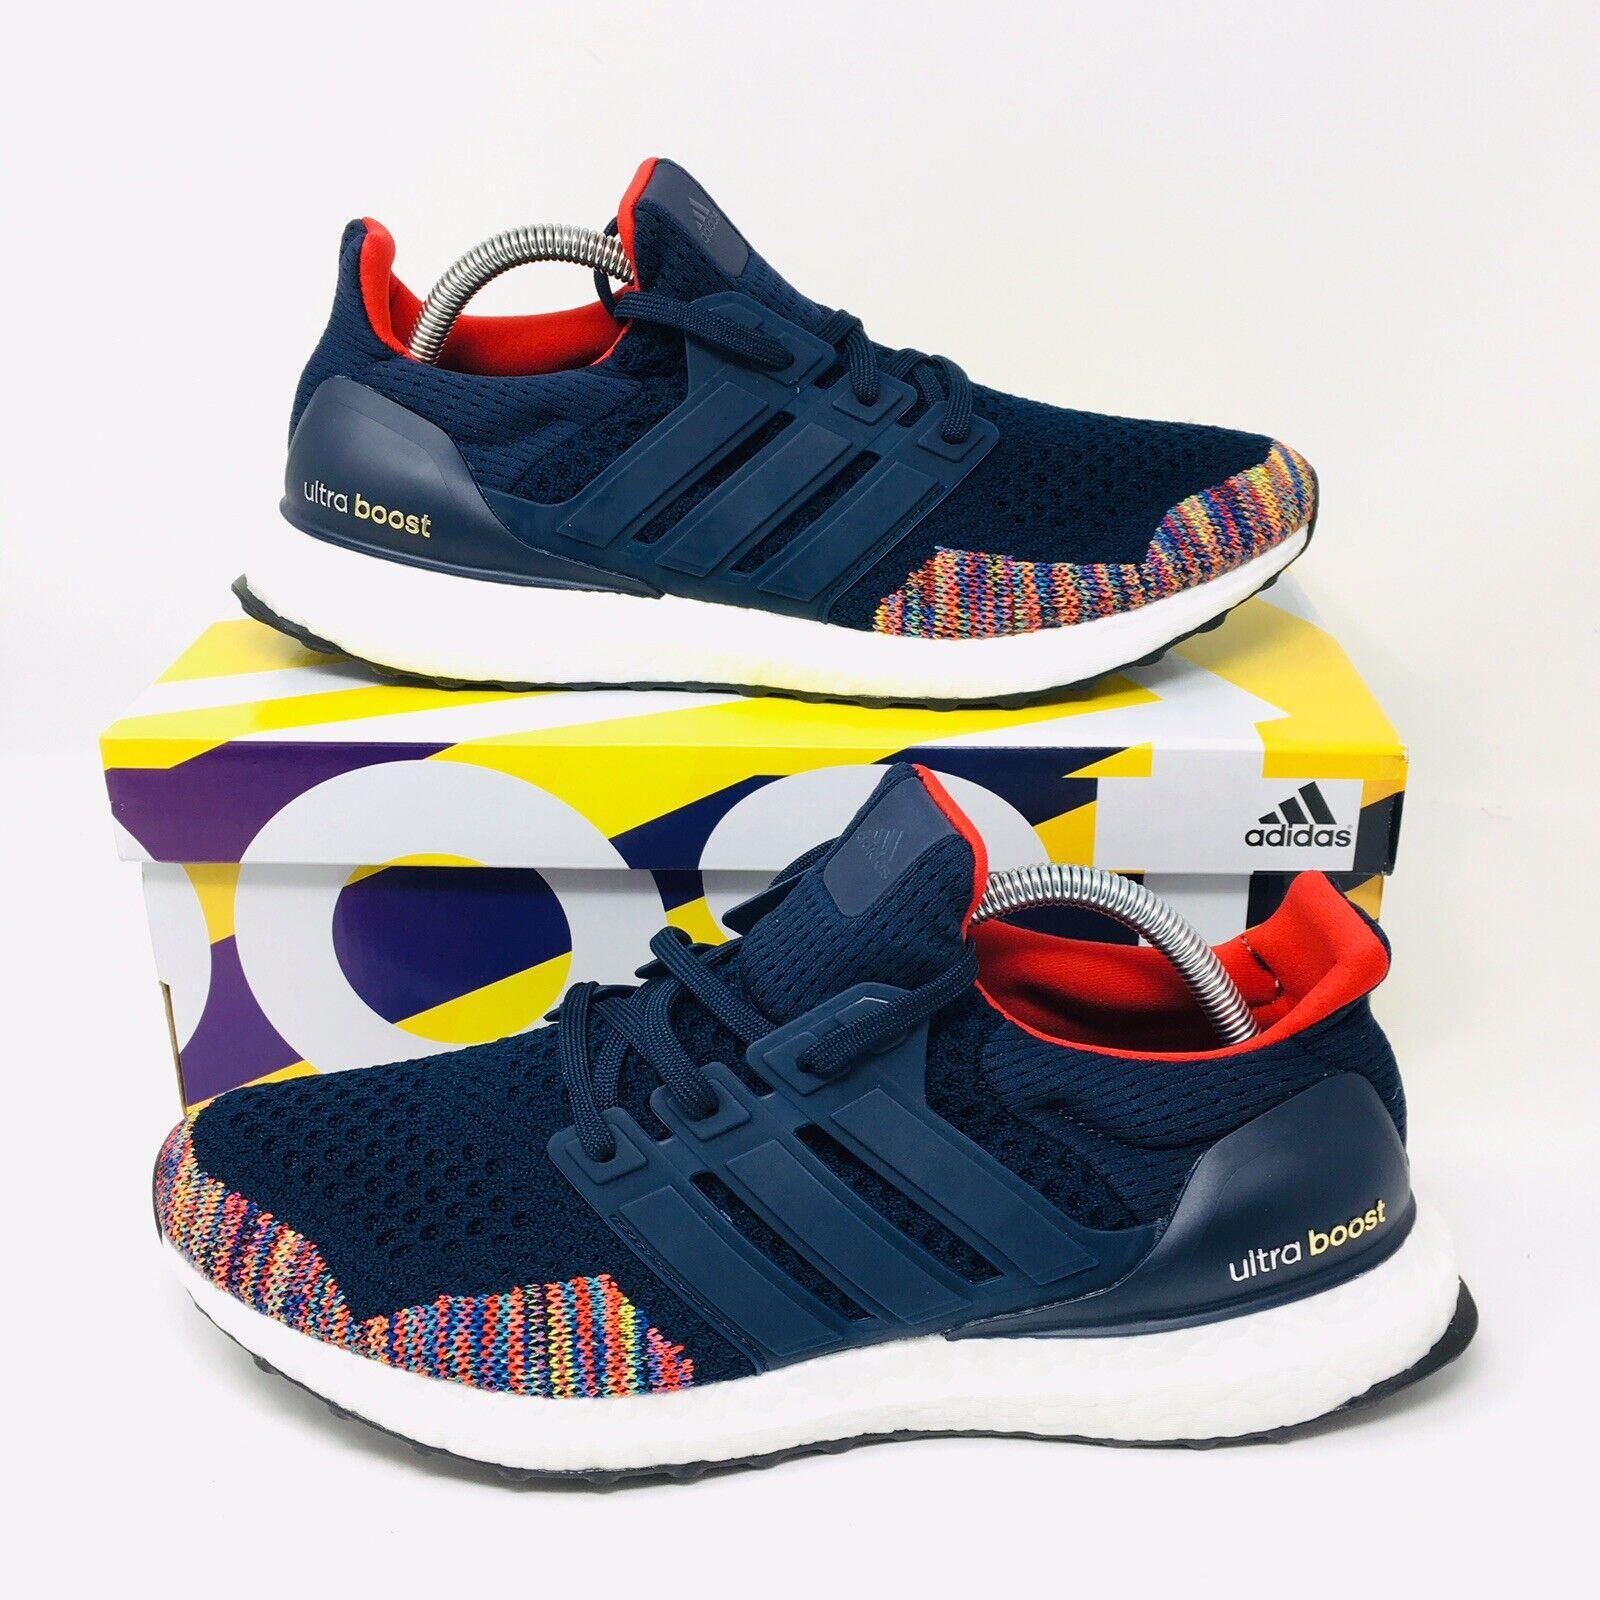 NEW Adidas Ultra Boost LTD (Men Size 10.5) Running shoes Navy Navy Red NMD CS